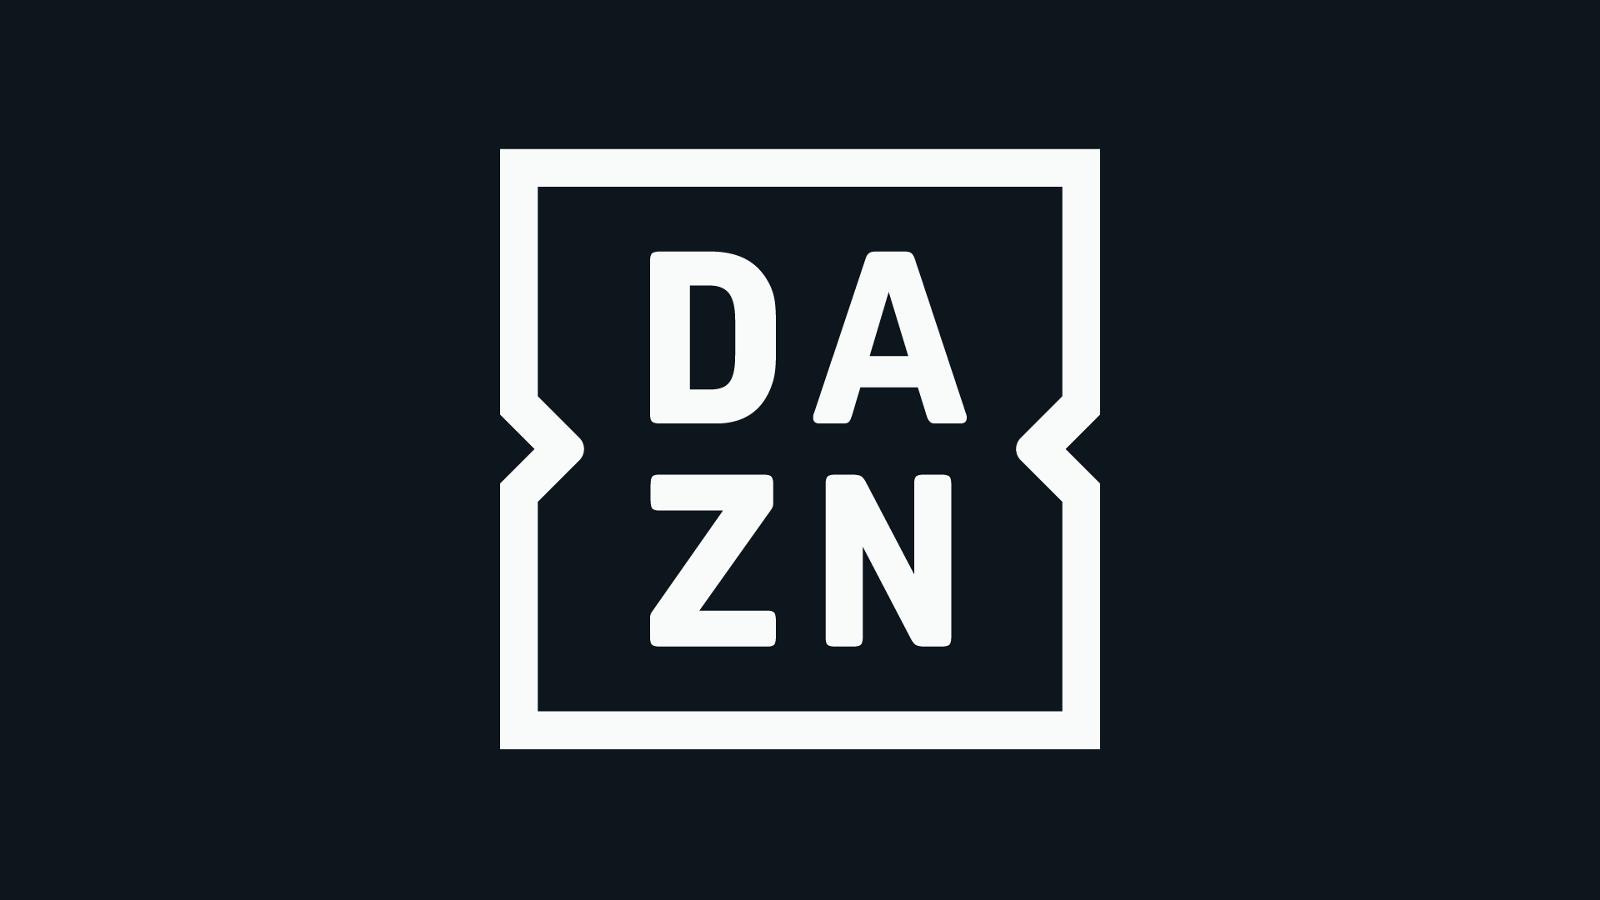 DAZN(ダゾーン)の月額料金とサービス内容について|お得な方法・注意点を徹底解説!